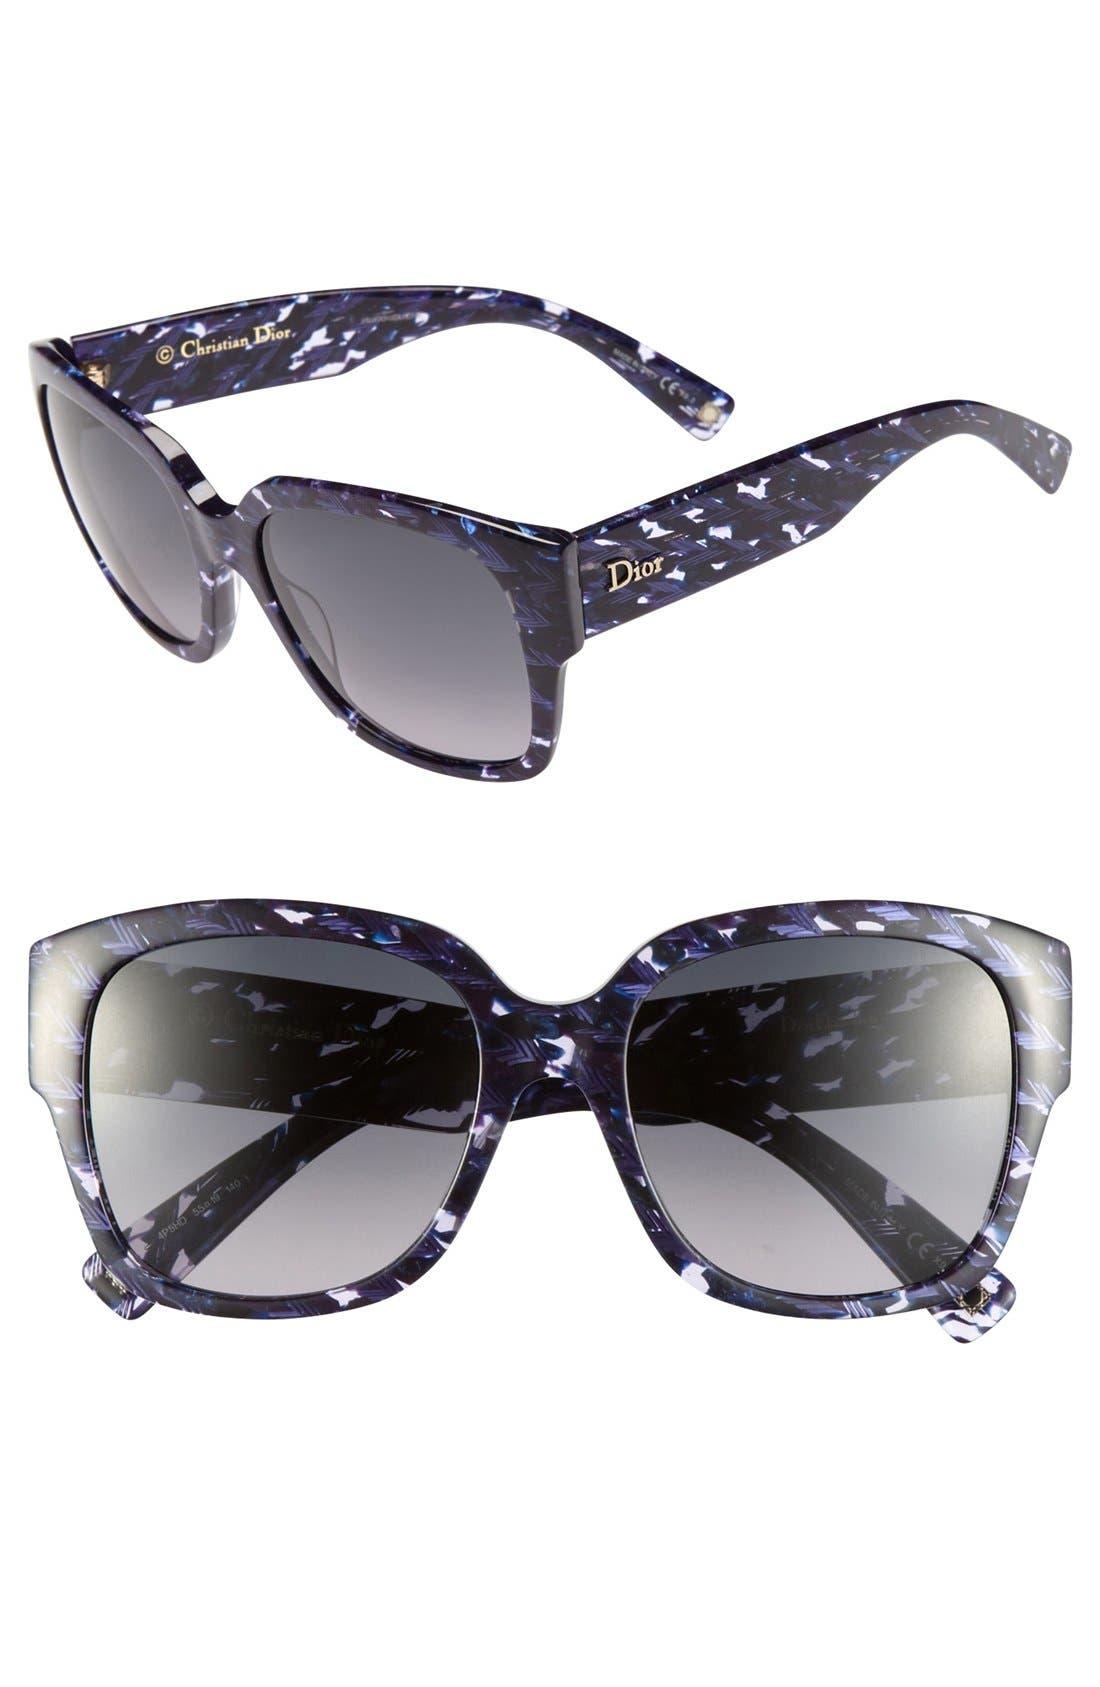 Alternate Image 1 Selected - Dior 'Flanelle' 55mm Sunglasses